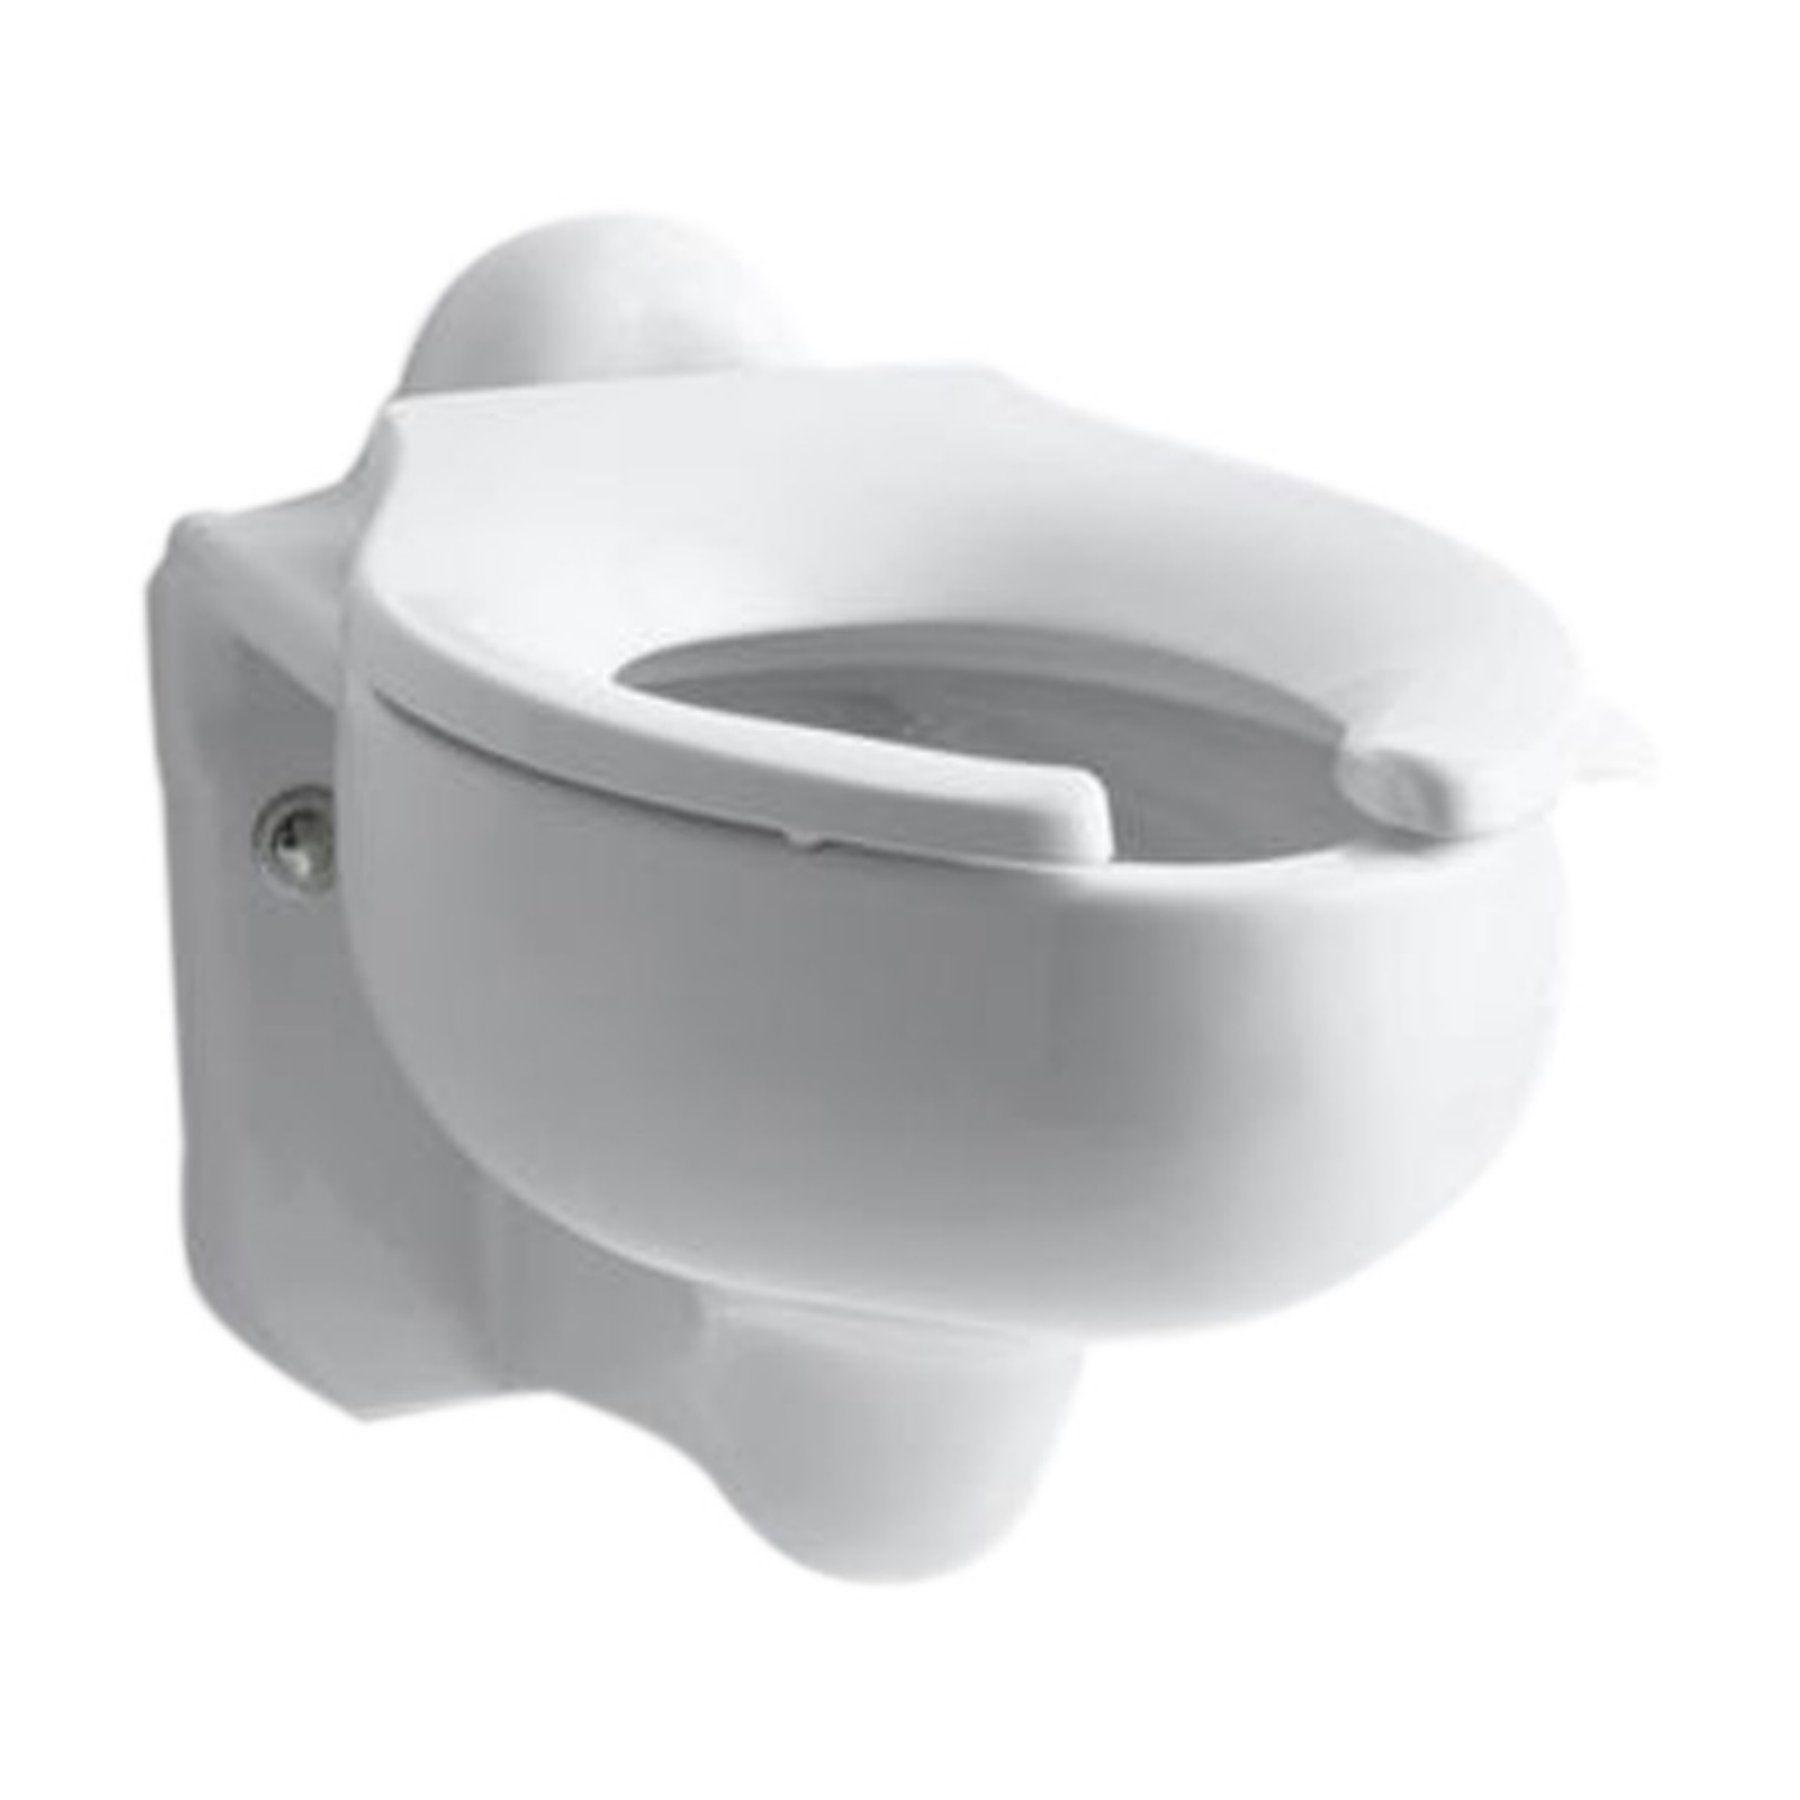 Kohler Sifton K4460 C 0 Wall Mount Elongated Toilet Bowl In 2019